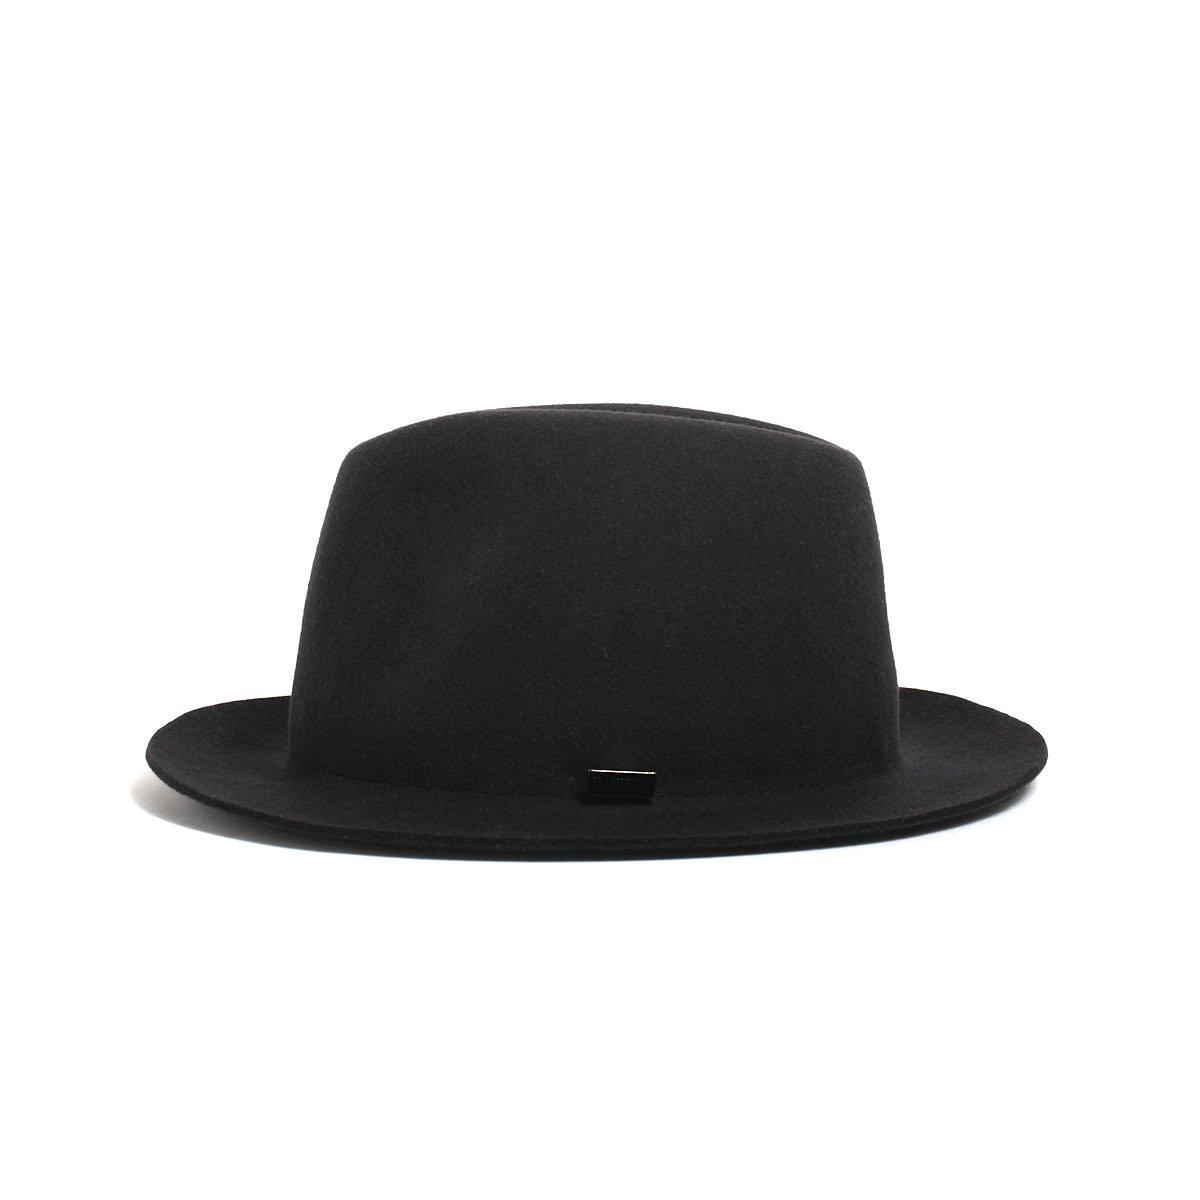 NOMAD FELT HAT SHORT 詳細画像7